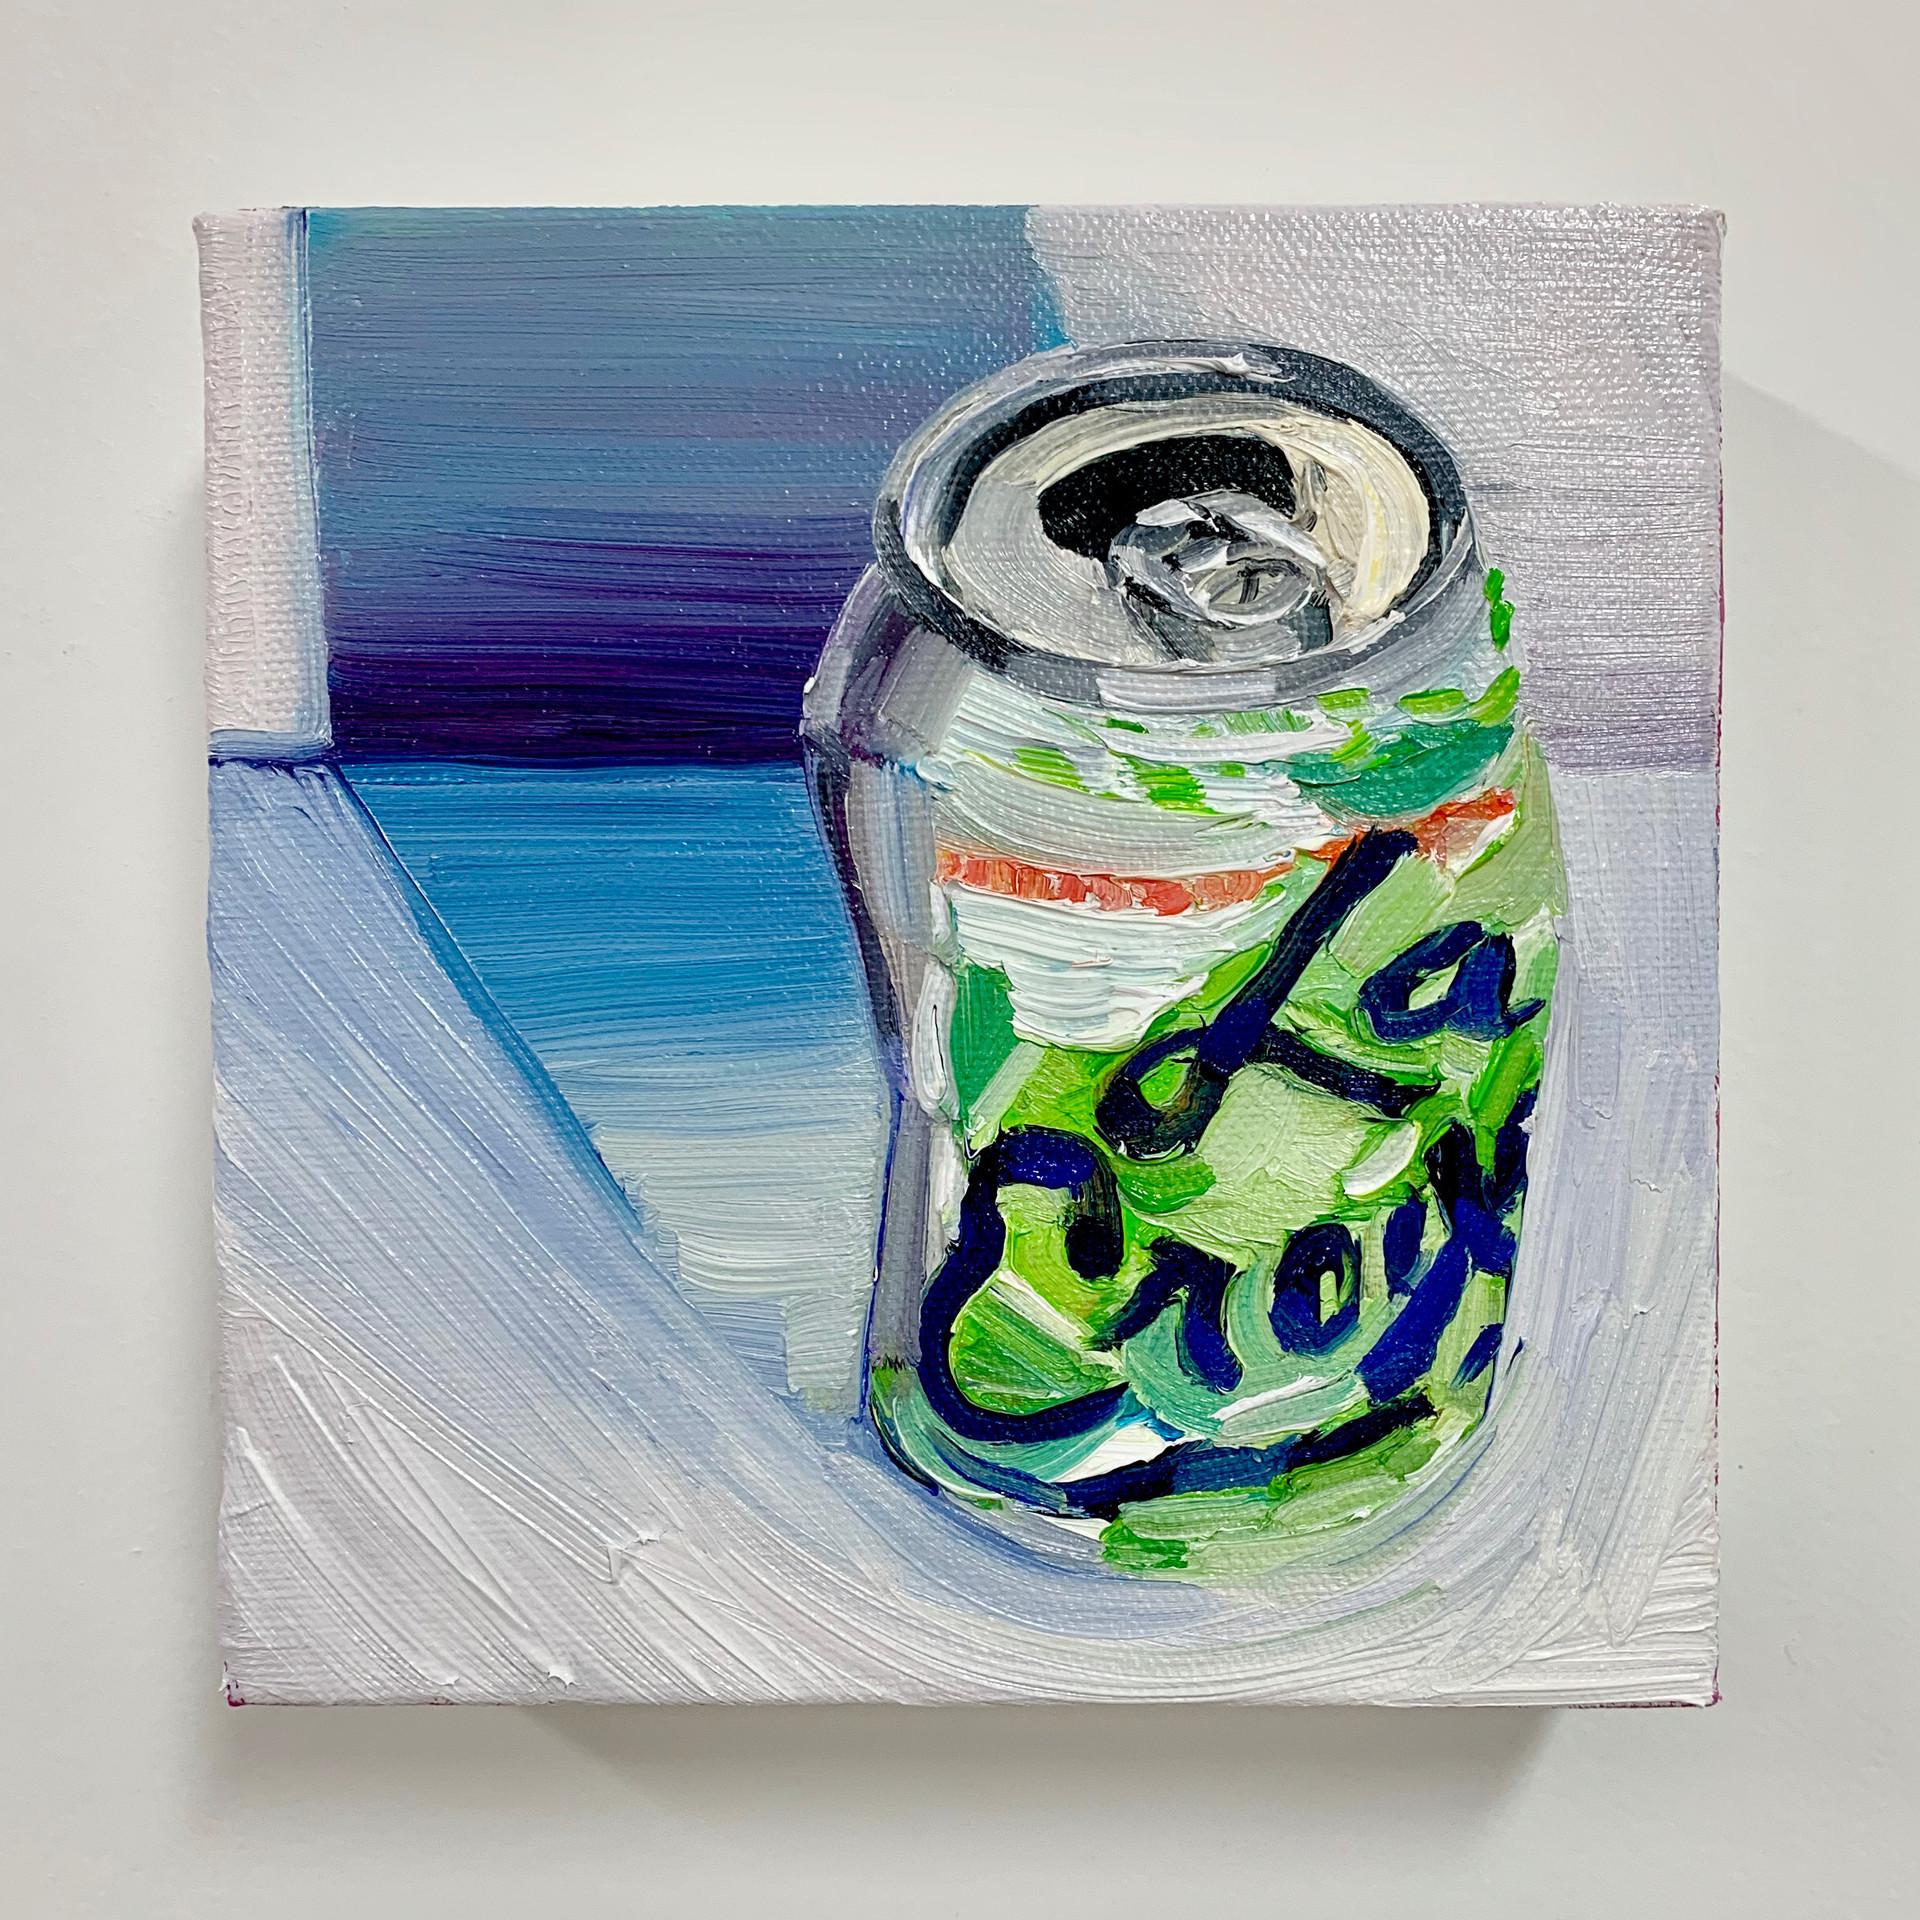 """La Croix 2"", Crushed Series, 5"" x 5"", oil on canvas, 2020"